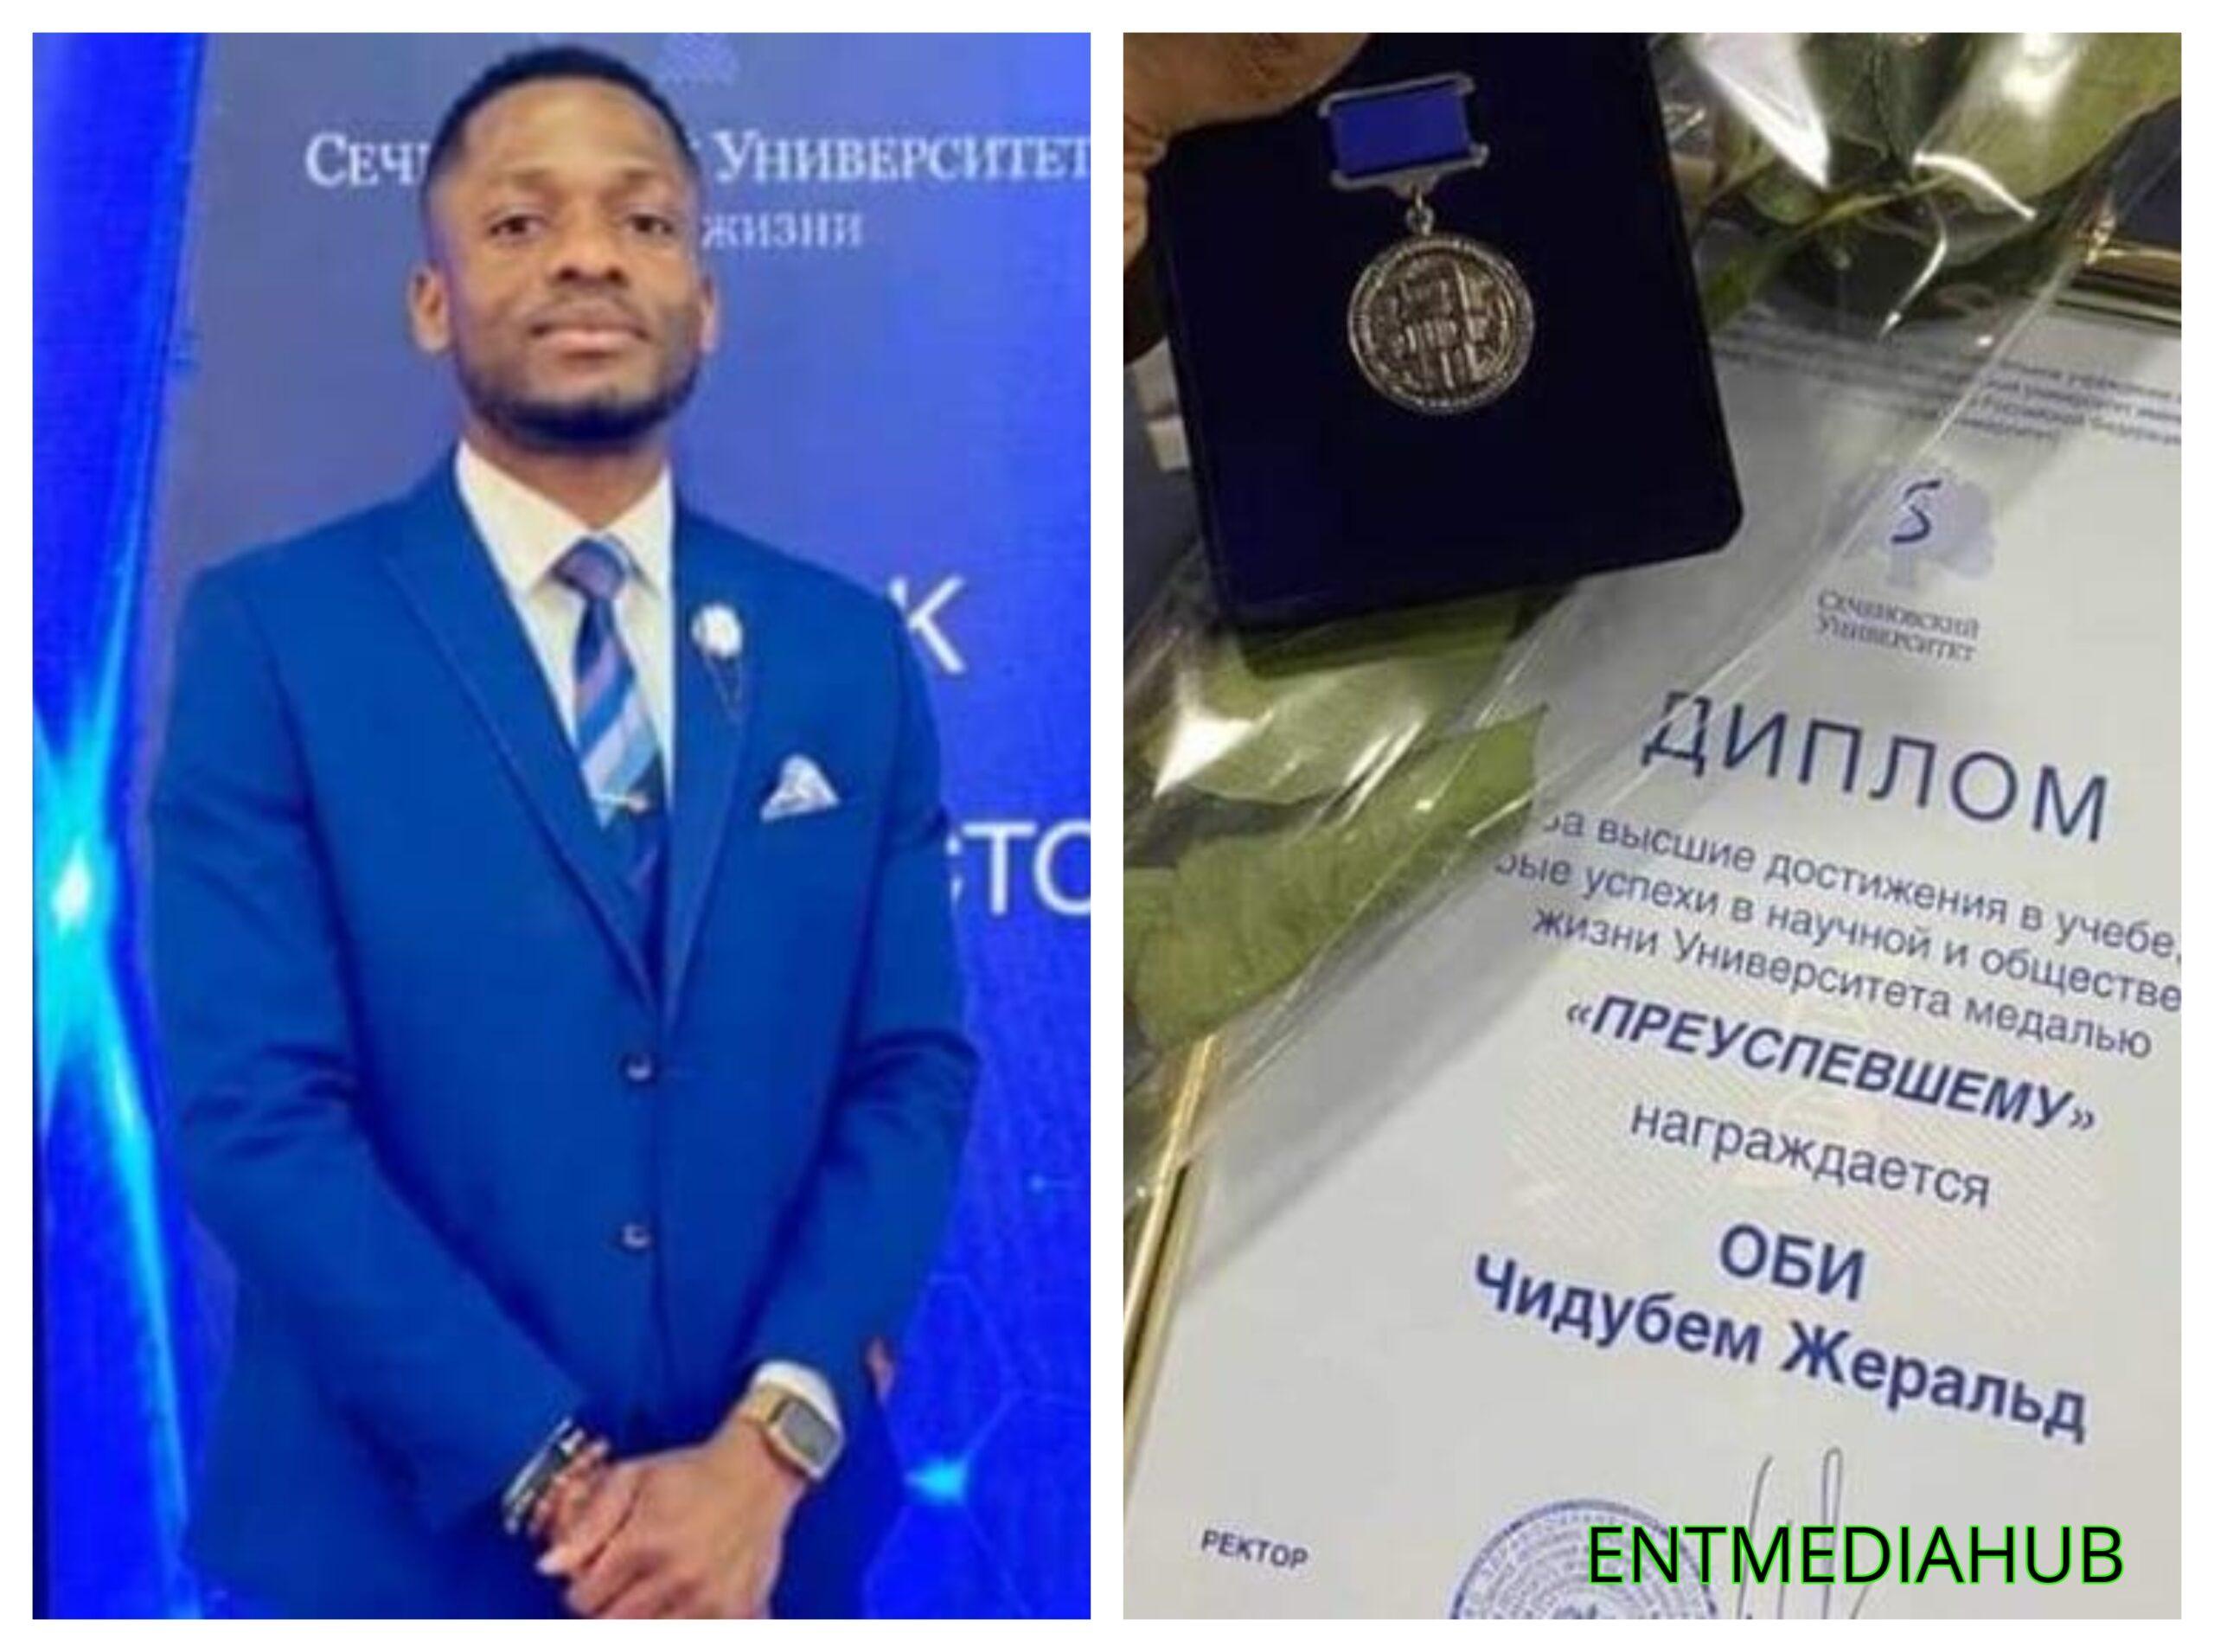 Nigerian man graduates with 5.0 GPA in a Russian university